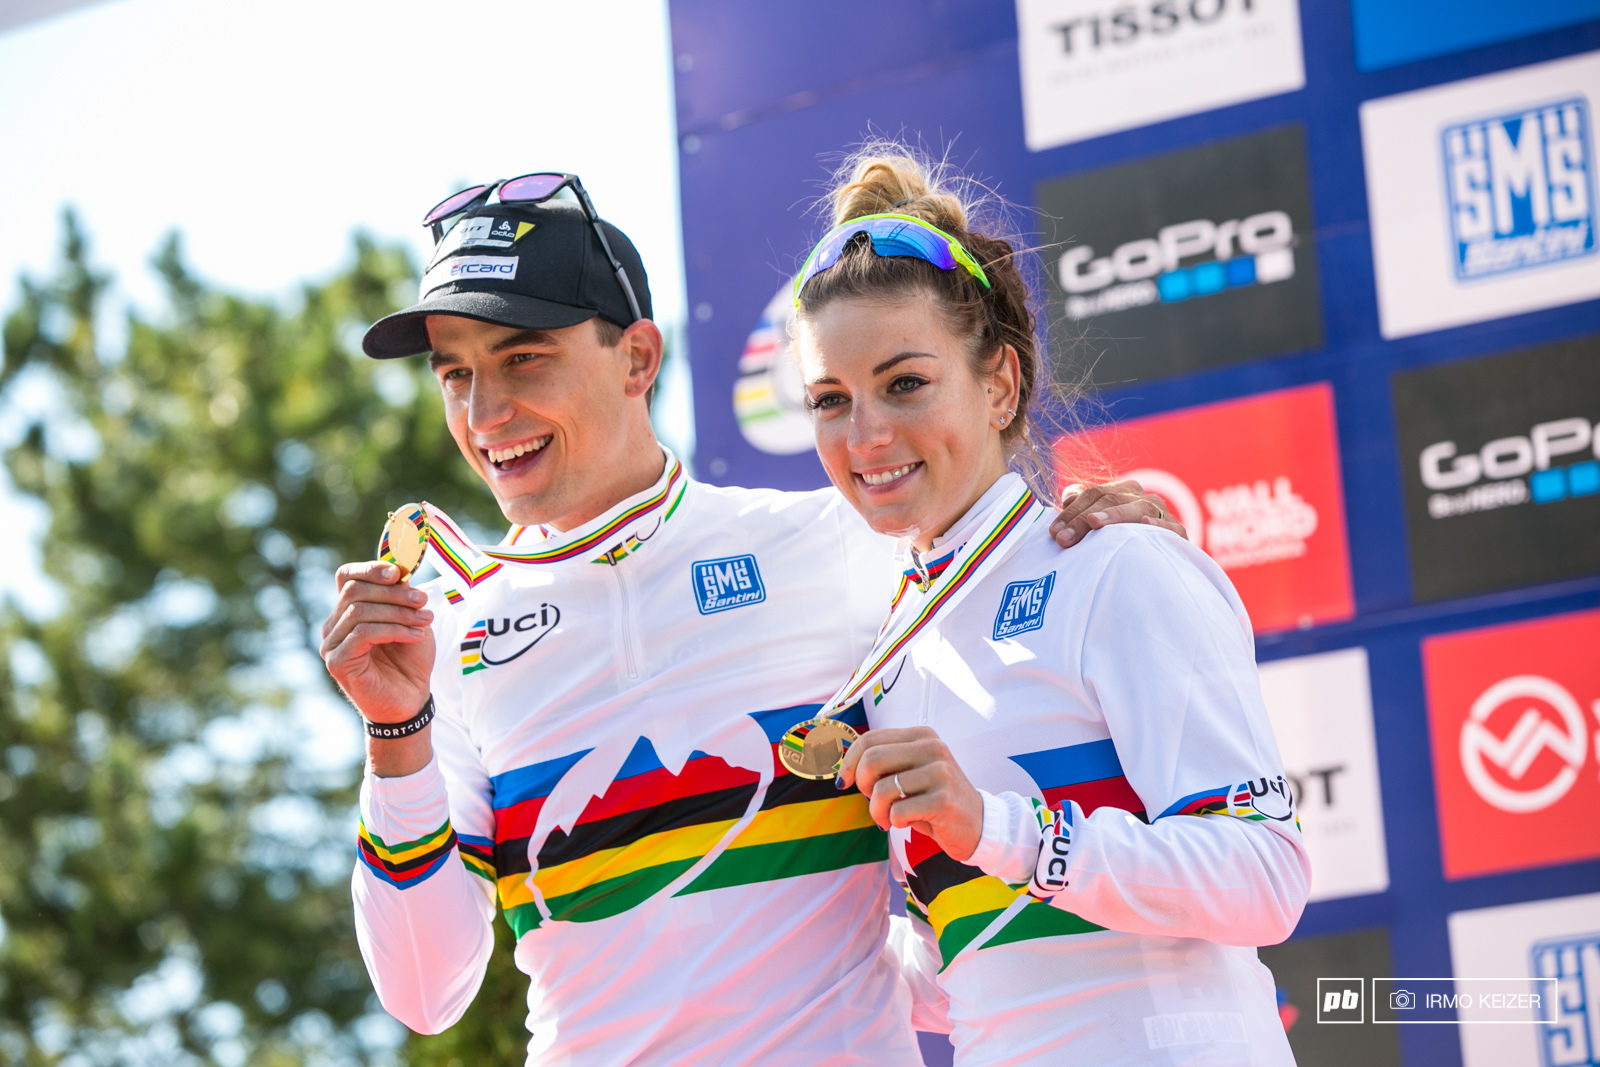 Your World Champions. Nino Schurter and Pauline Ferrand-Prevot.